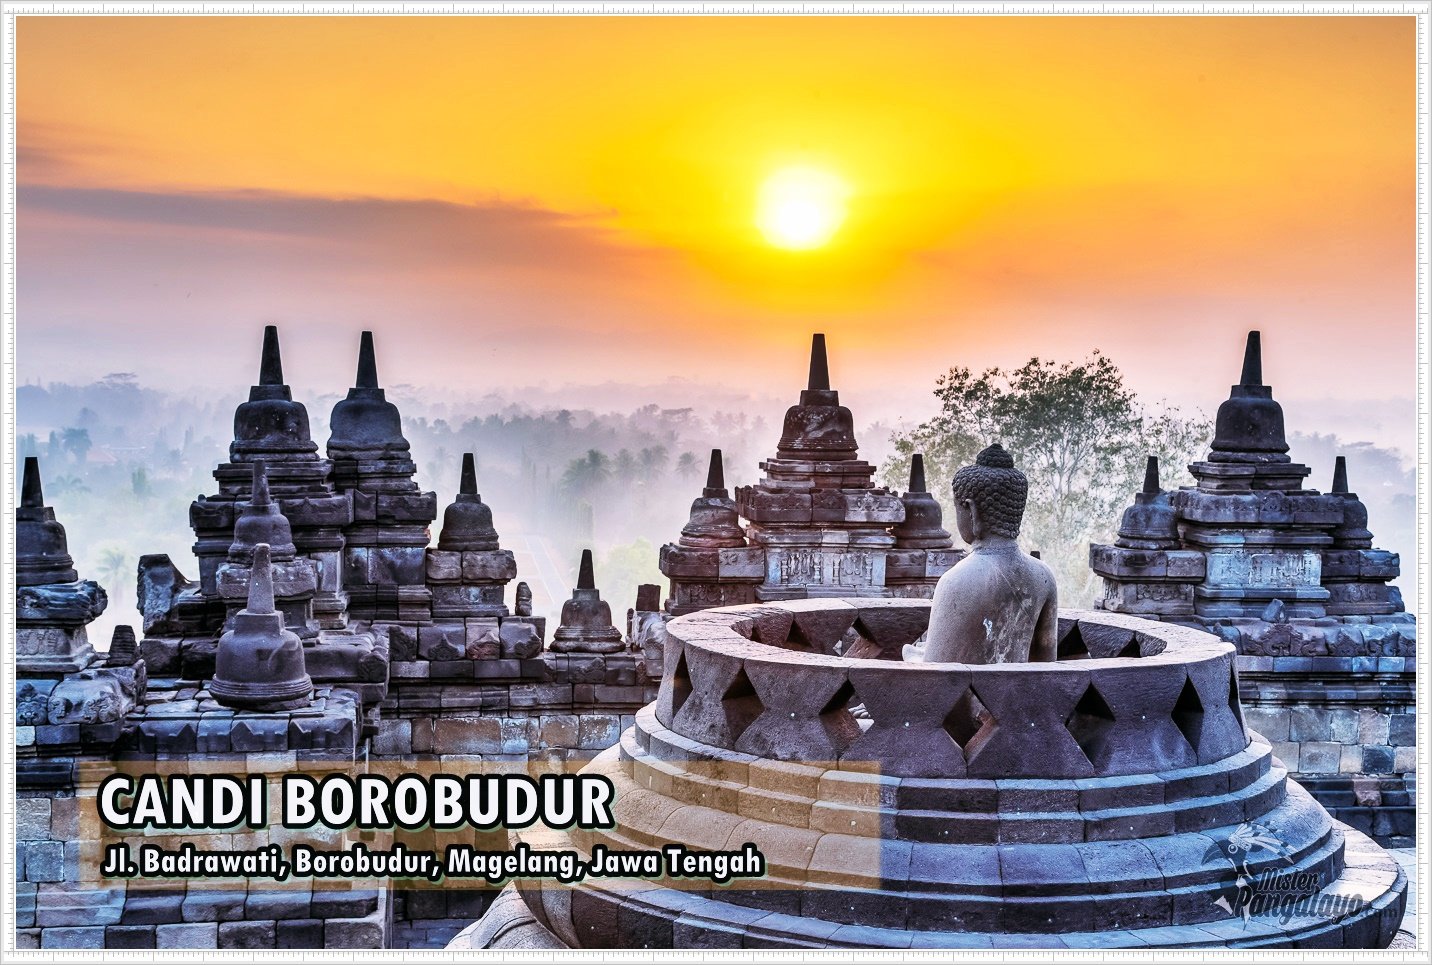 Candi Borobudur sebagai warisan budaya dunia